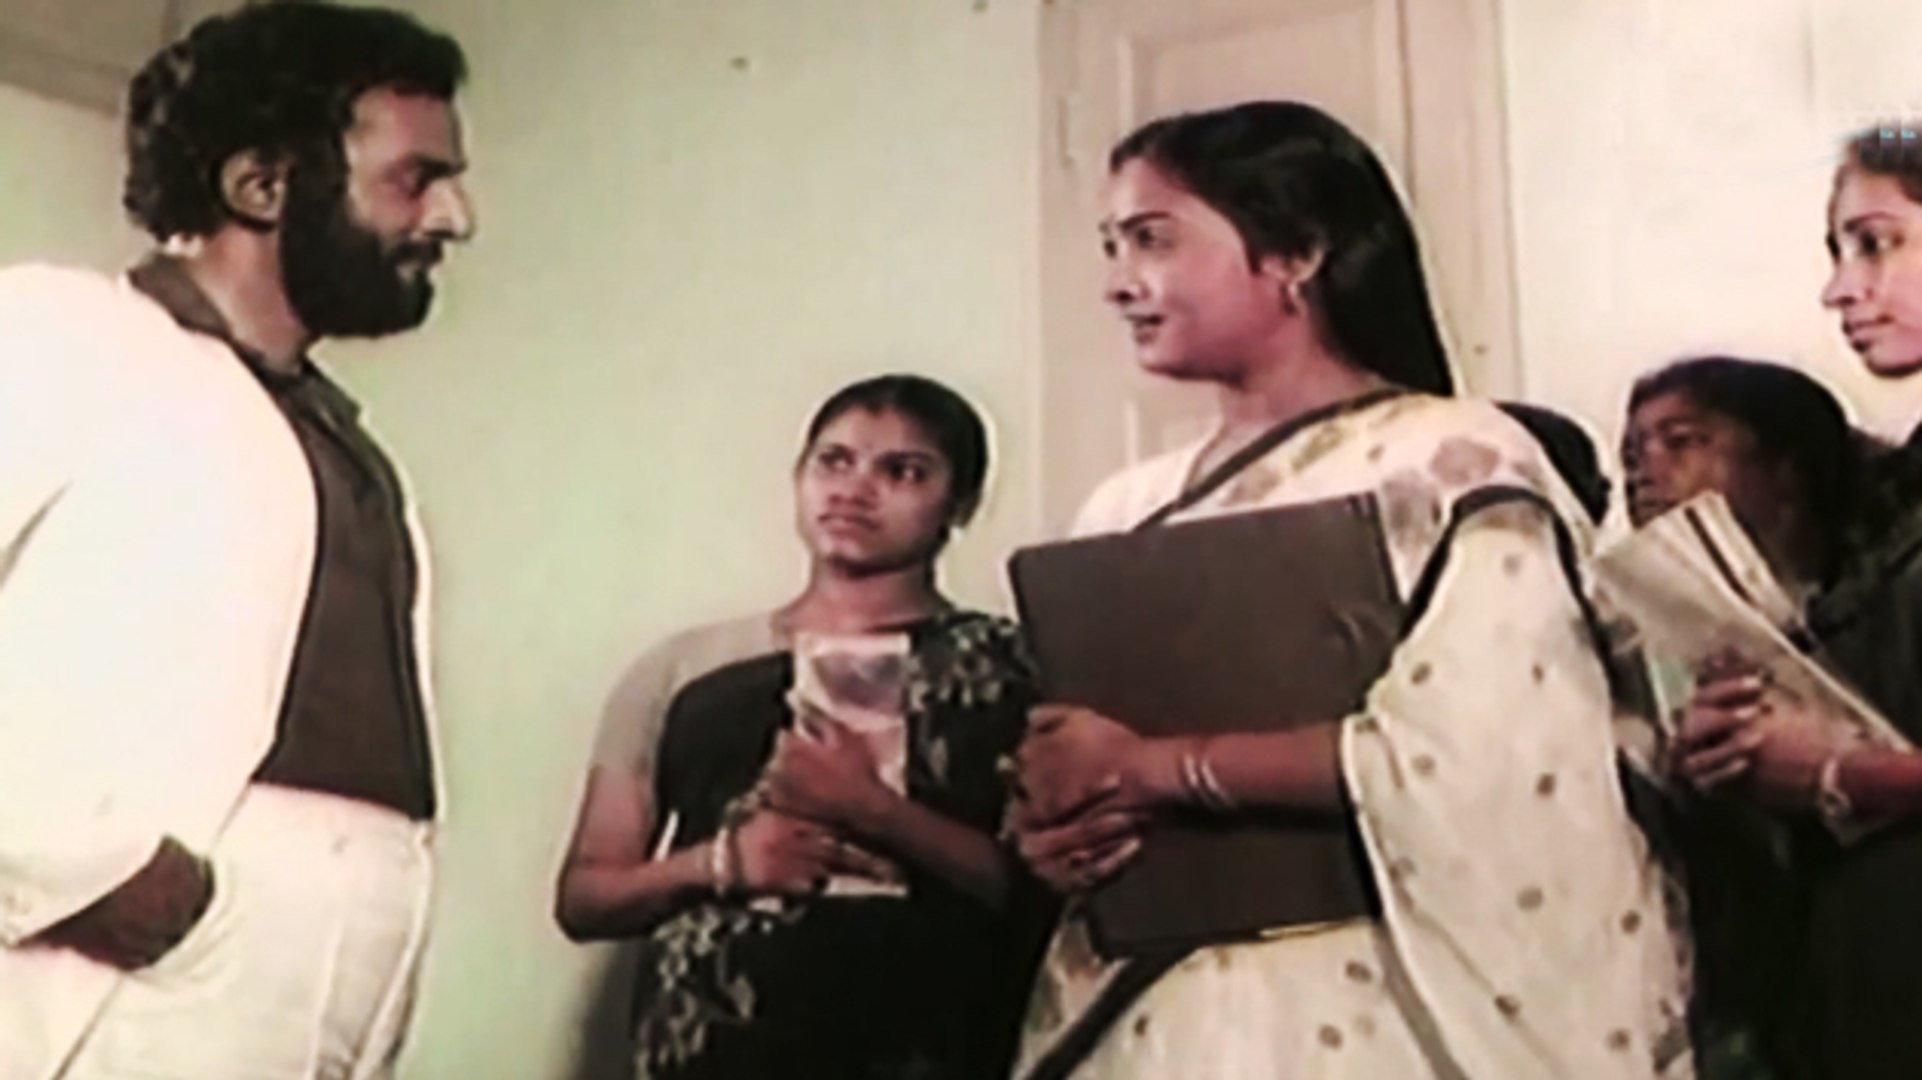 Bad Guy is Forcing a HOT Lady | Ellavarkum Nanmakal | Malayalam Film